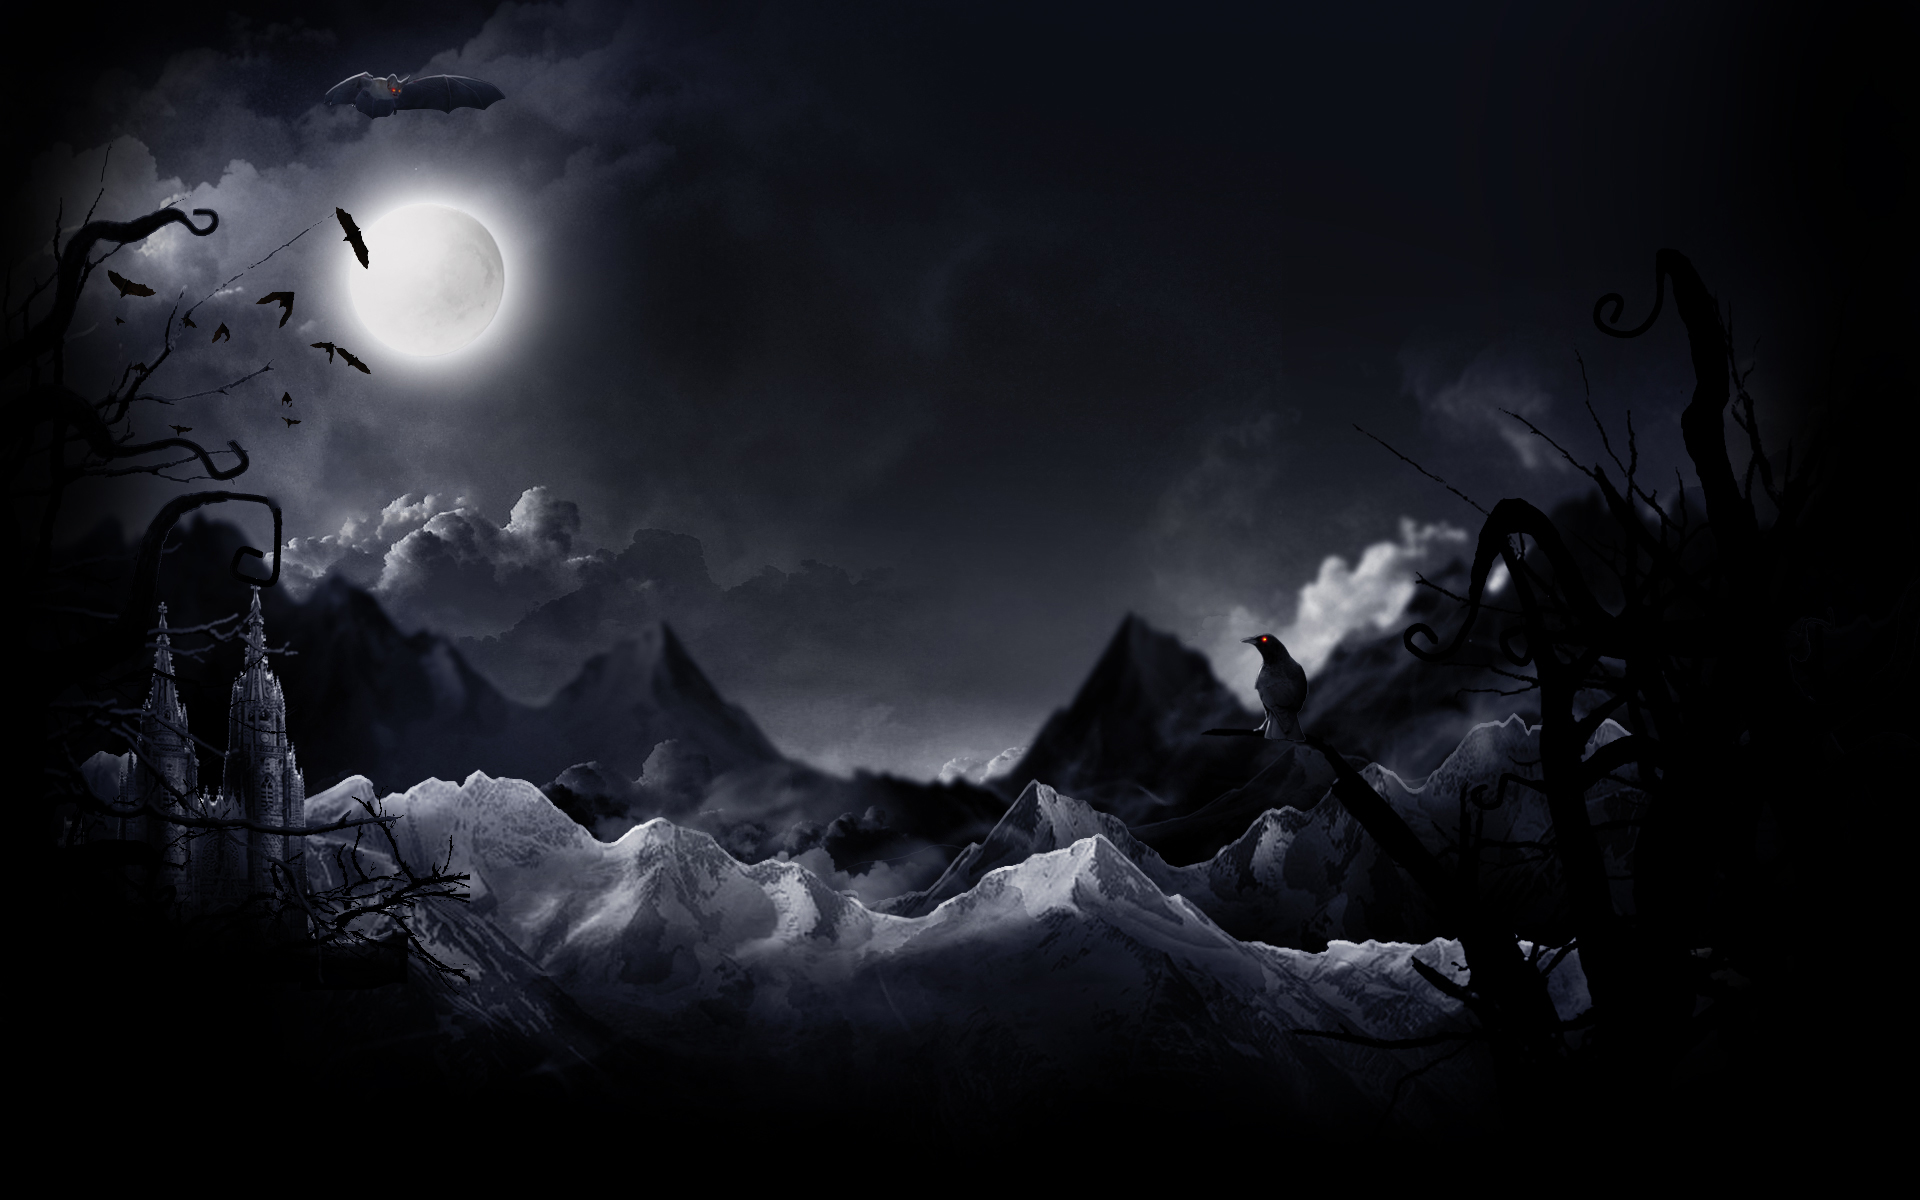 Download Wallpaper Night Dark - 748996  Picture.png